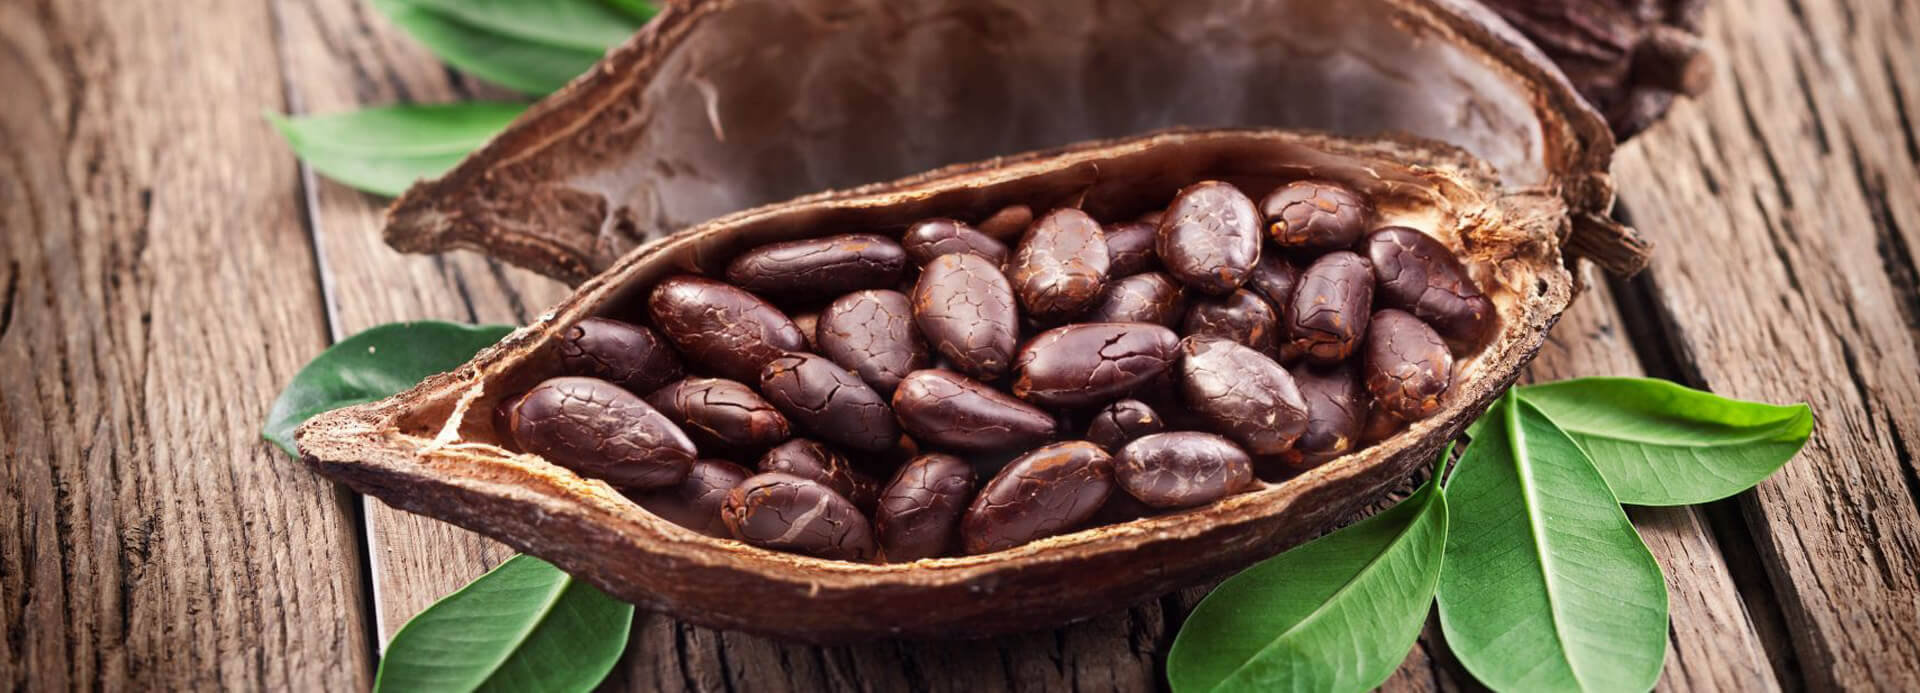 Kakaobohnen aus fairem Anbau